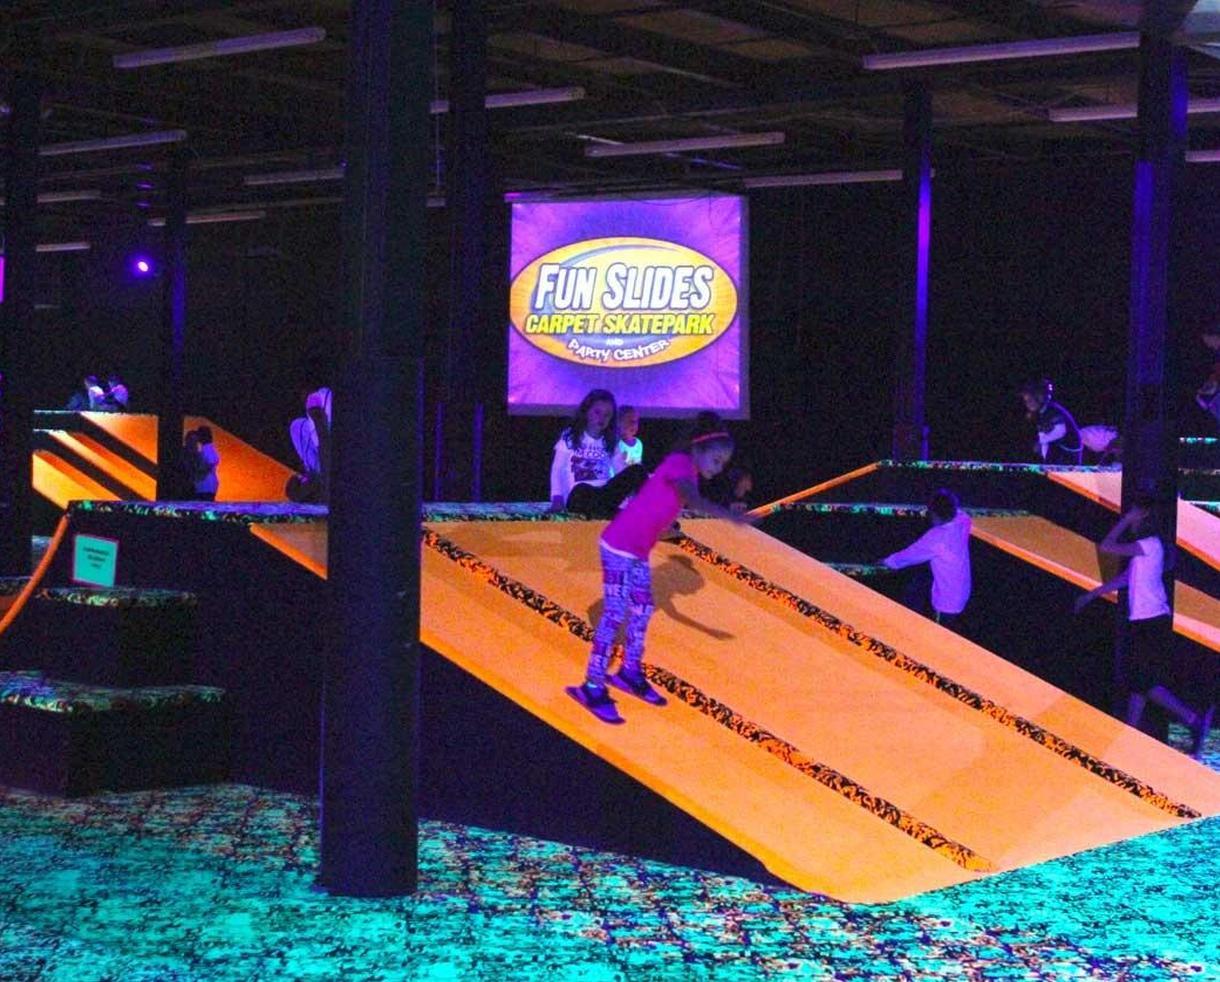 Fun Slides Carpet Skatepark and Party Center Three-Hour Carpet Skate Packages